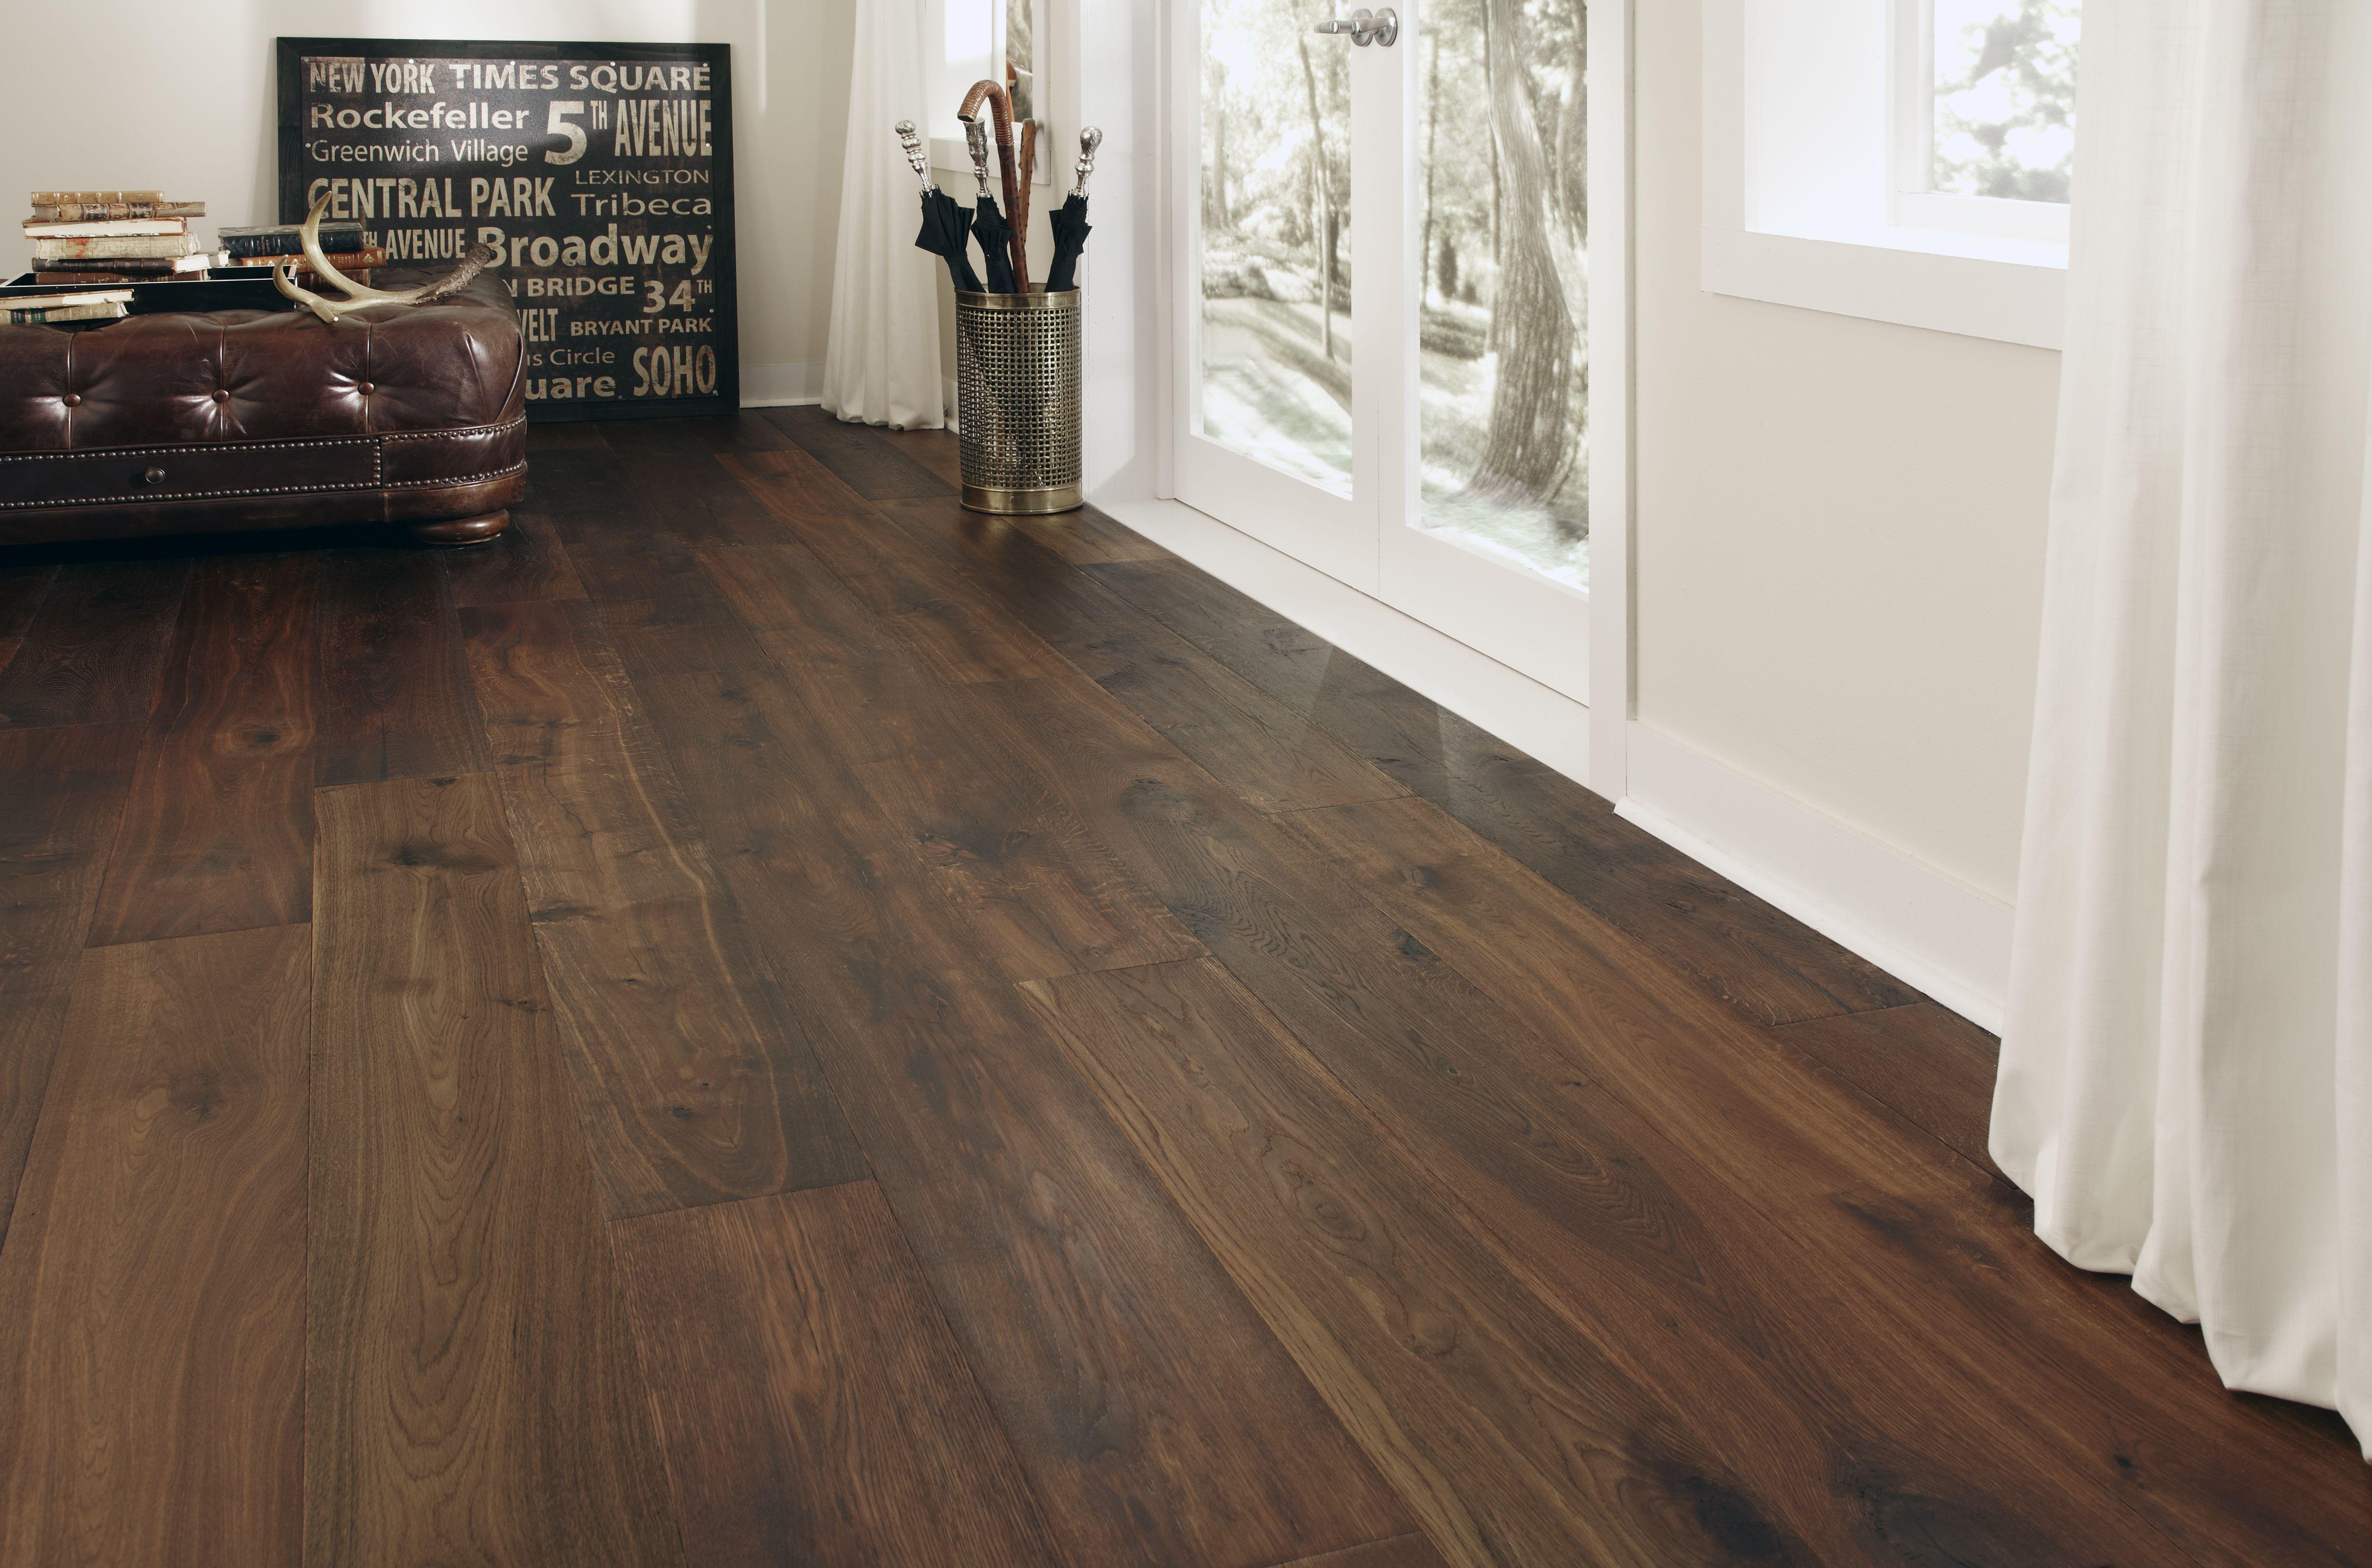 Montage European Oak S Vintage Hardwood Flooring Captures The Essence European Style With Its Antiquing And Heirloom E Decoration Interieure Decoration Parquet